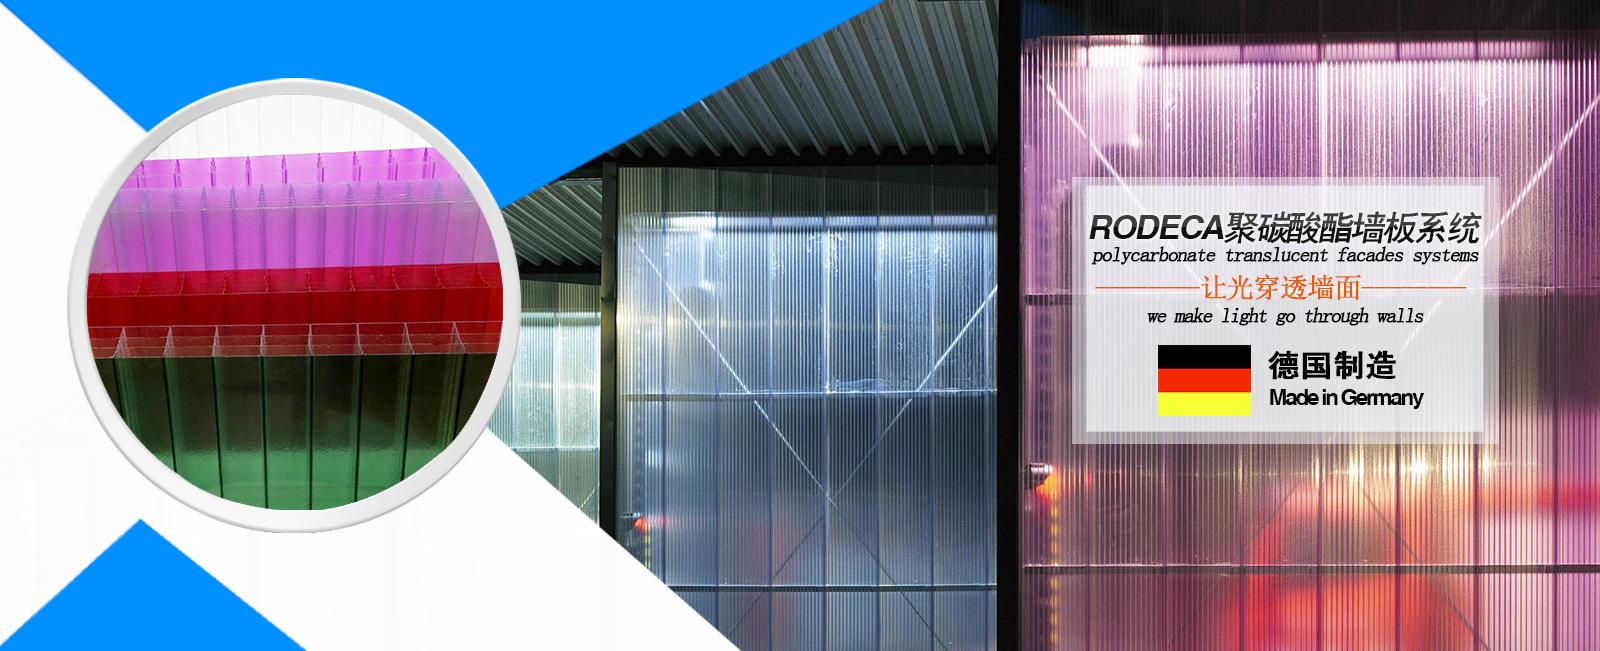 Rodeca聚碳酸酯墙板系统